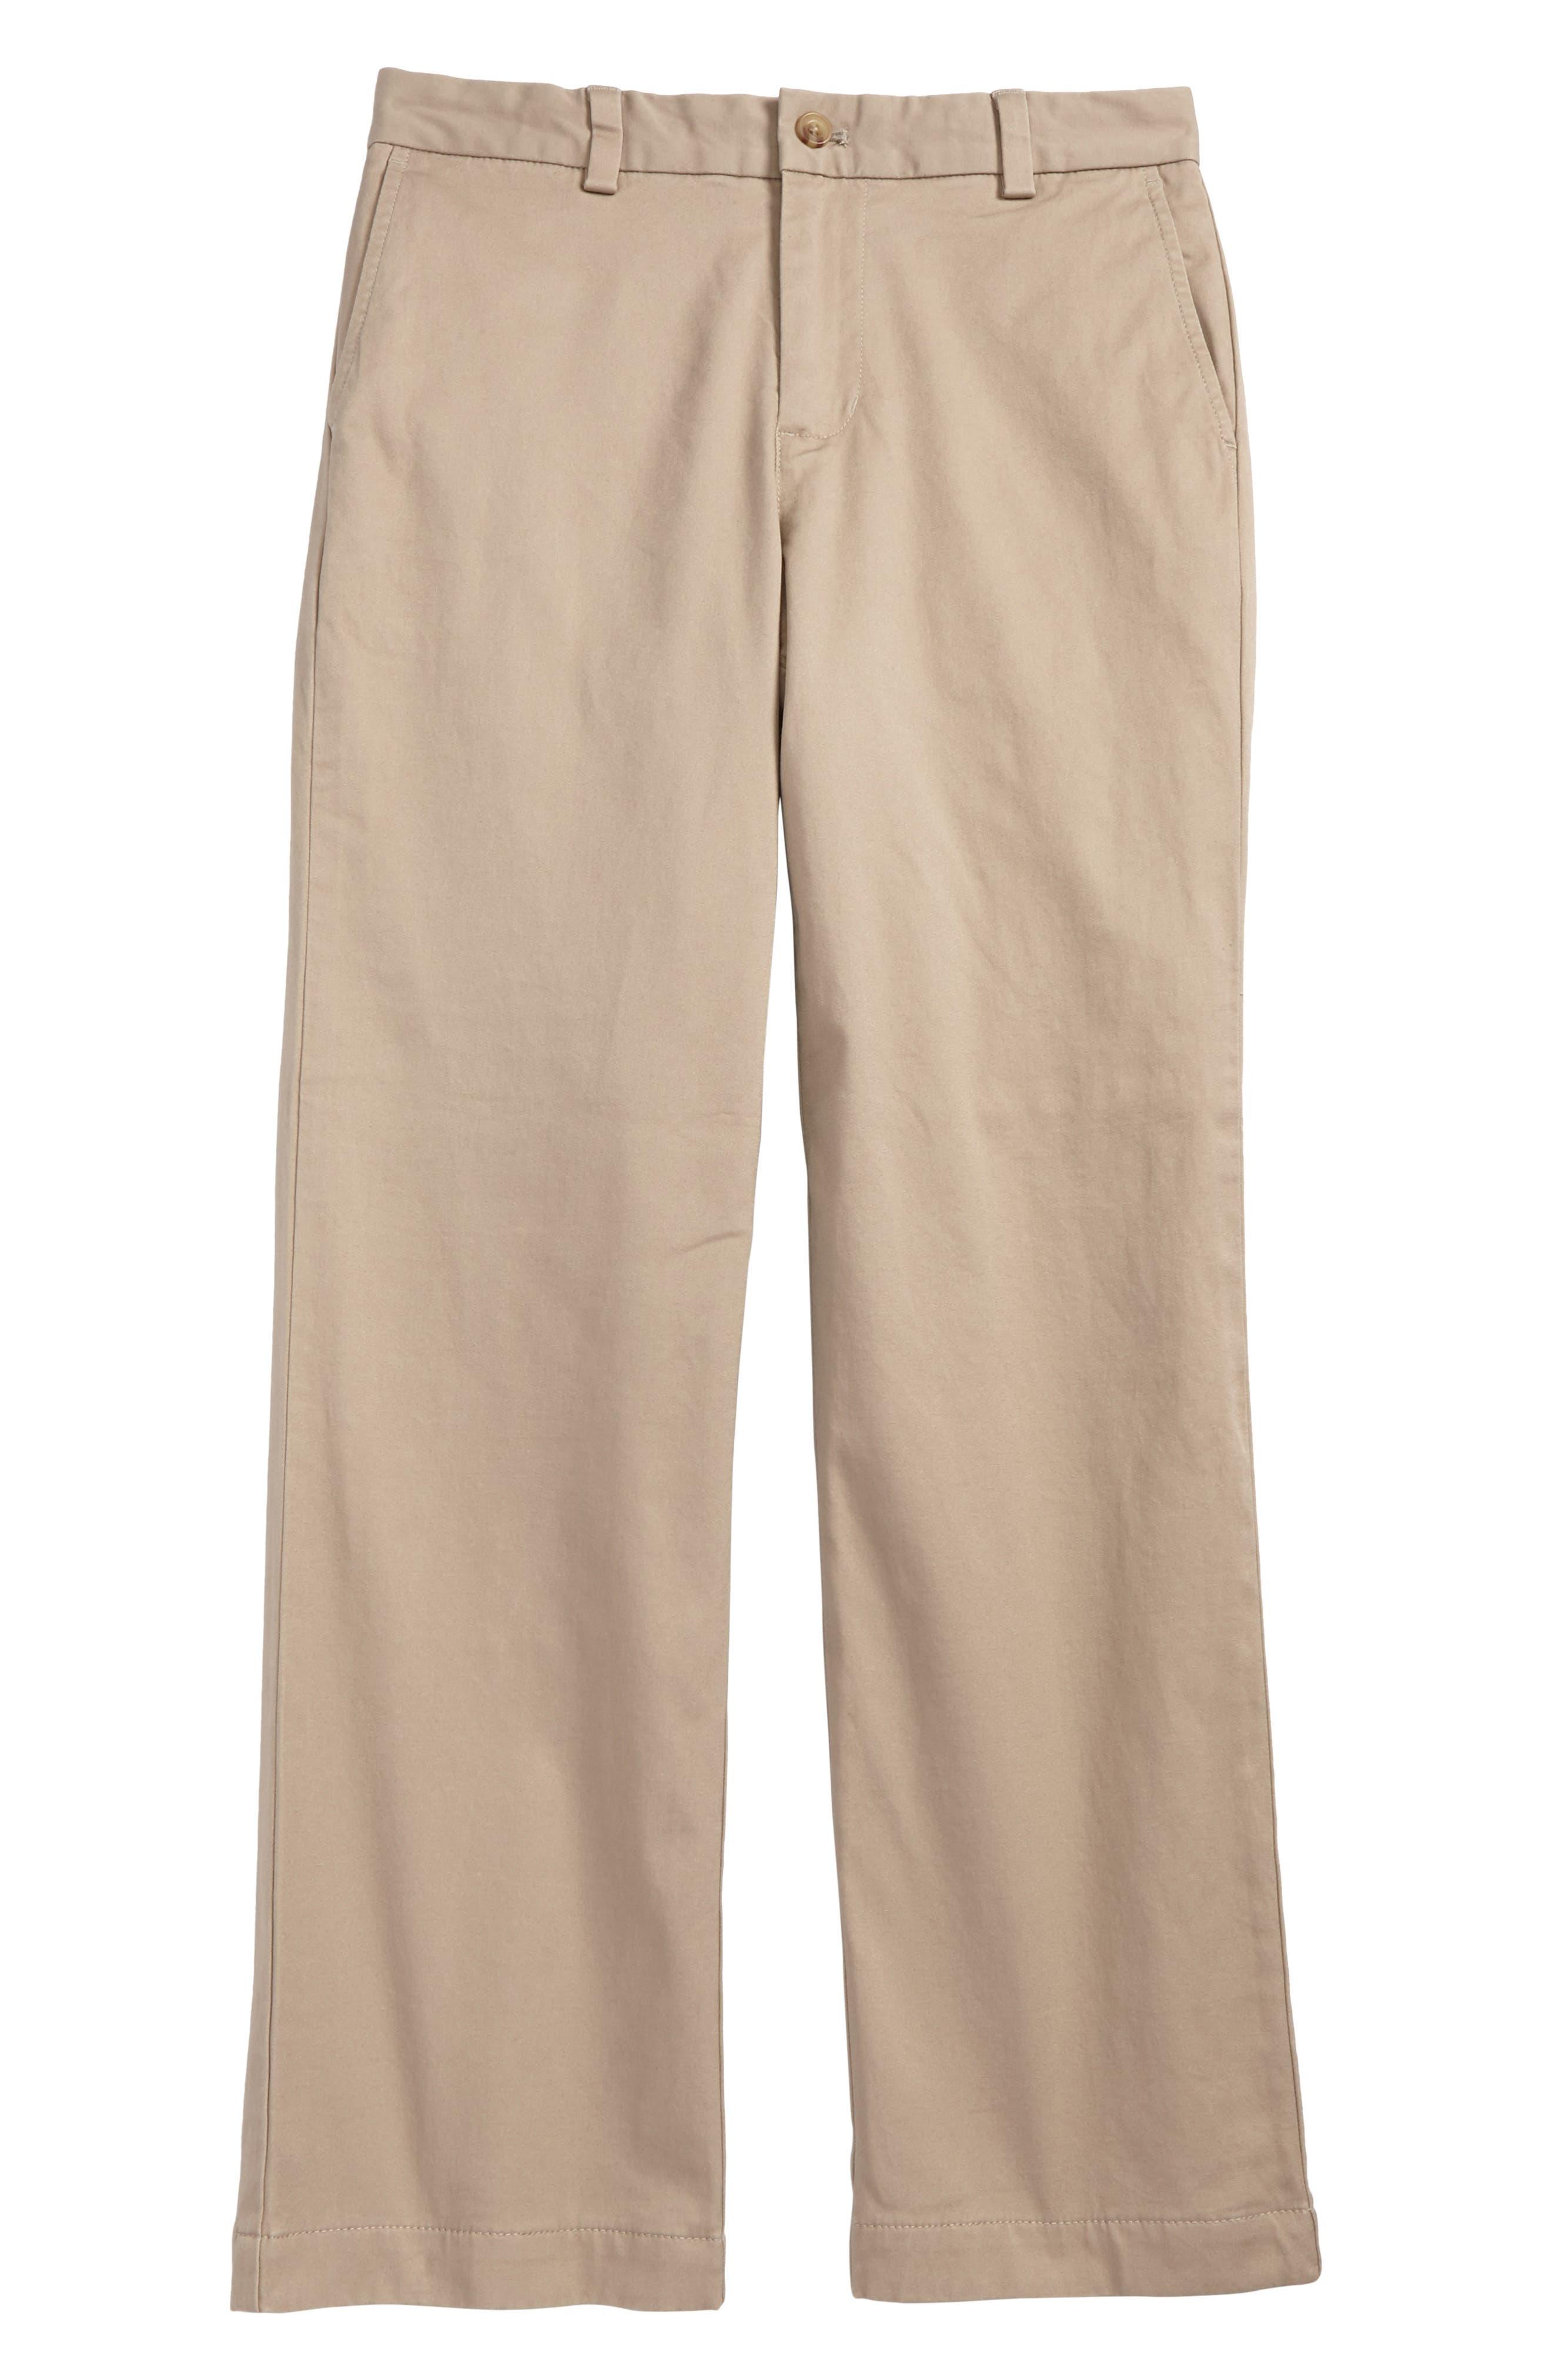 Breaker Flannel Lined Pants,                         Main,                         color, Khaki